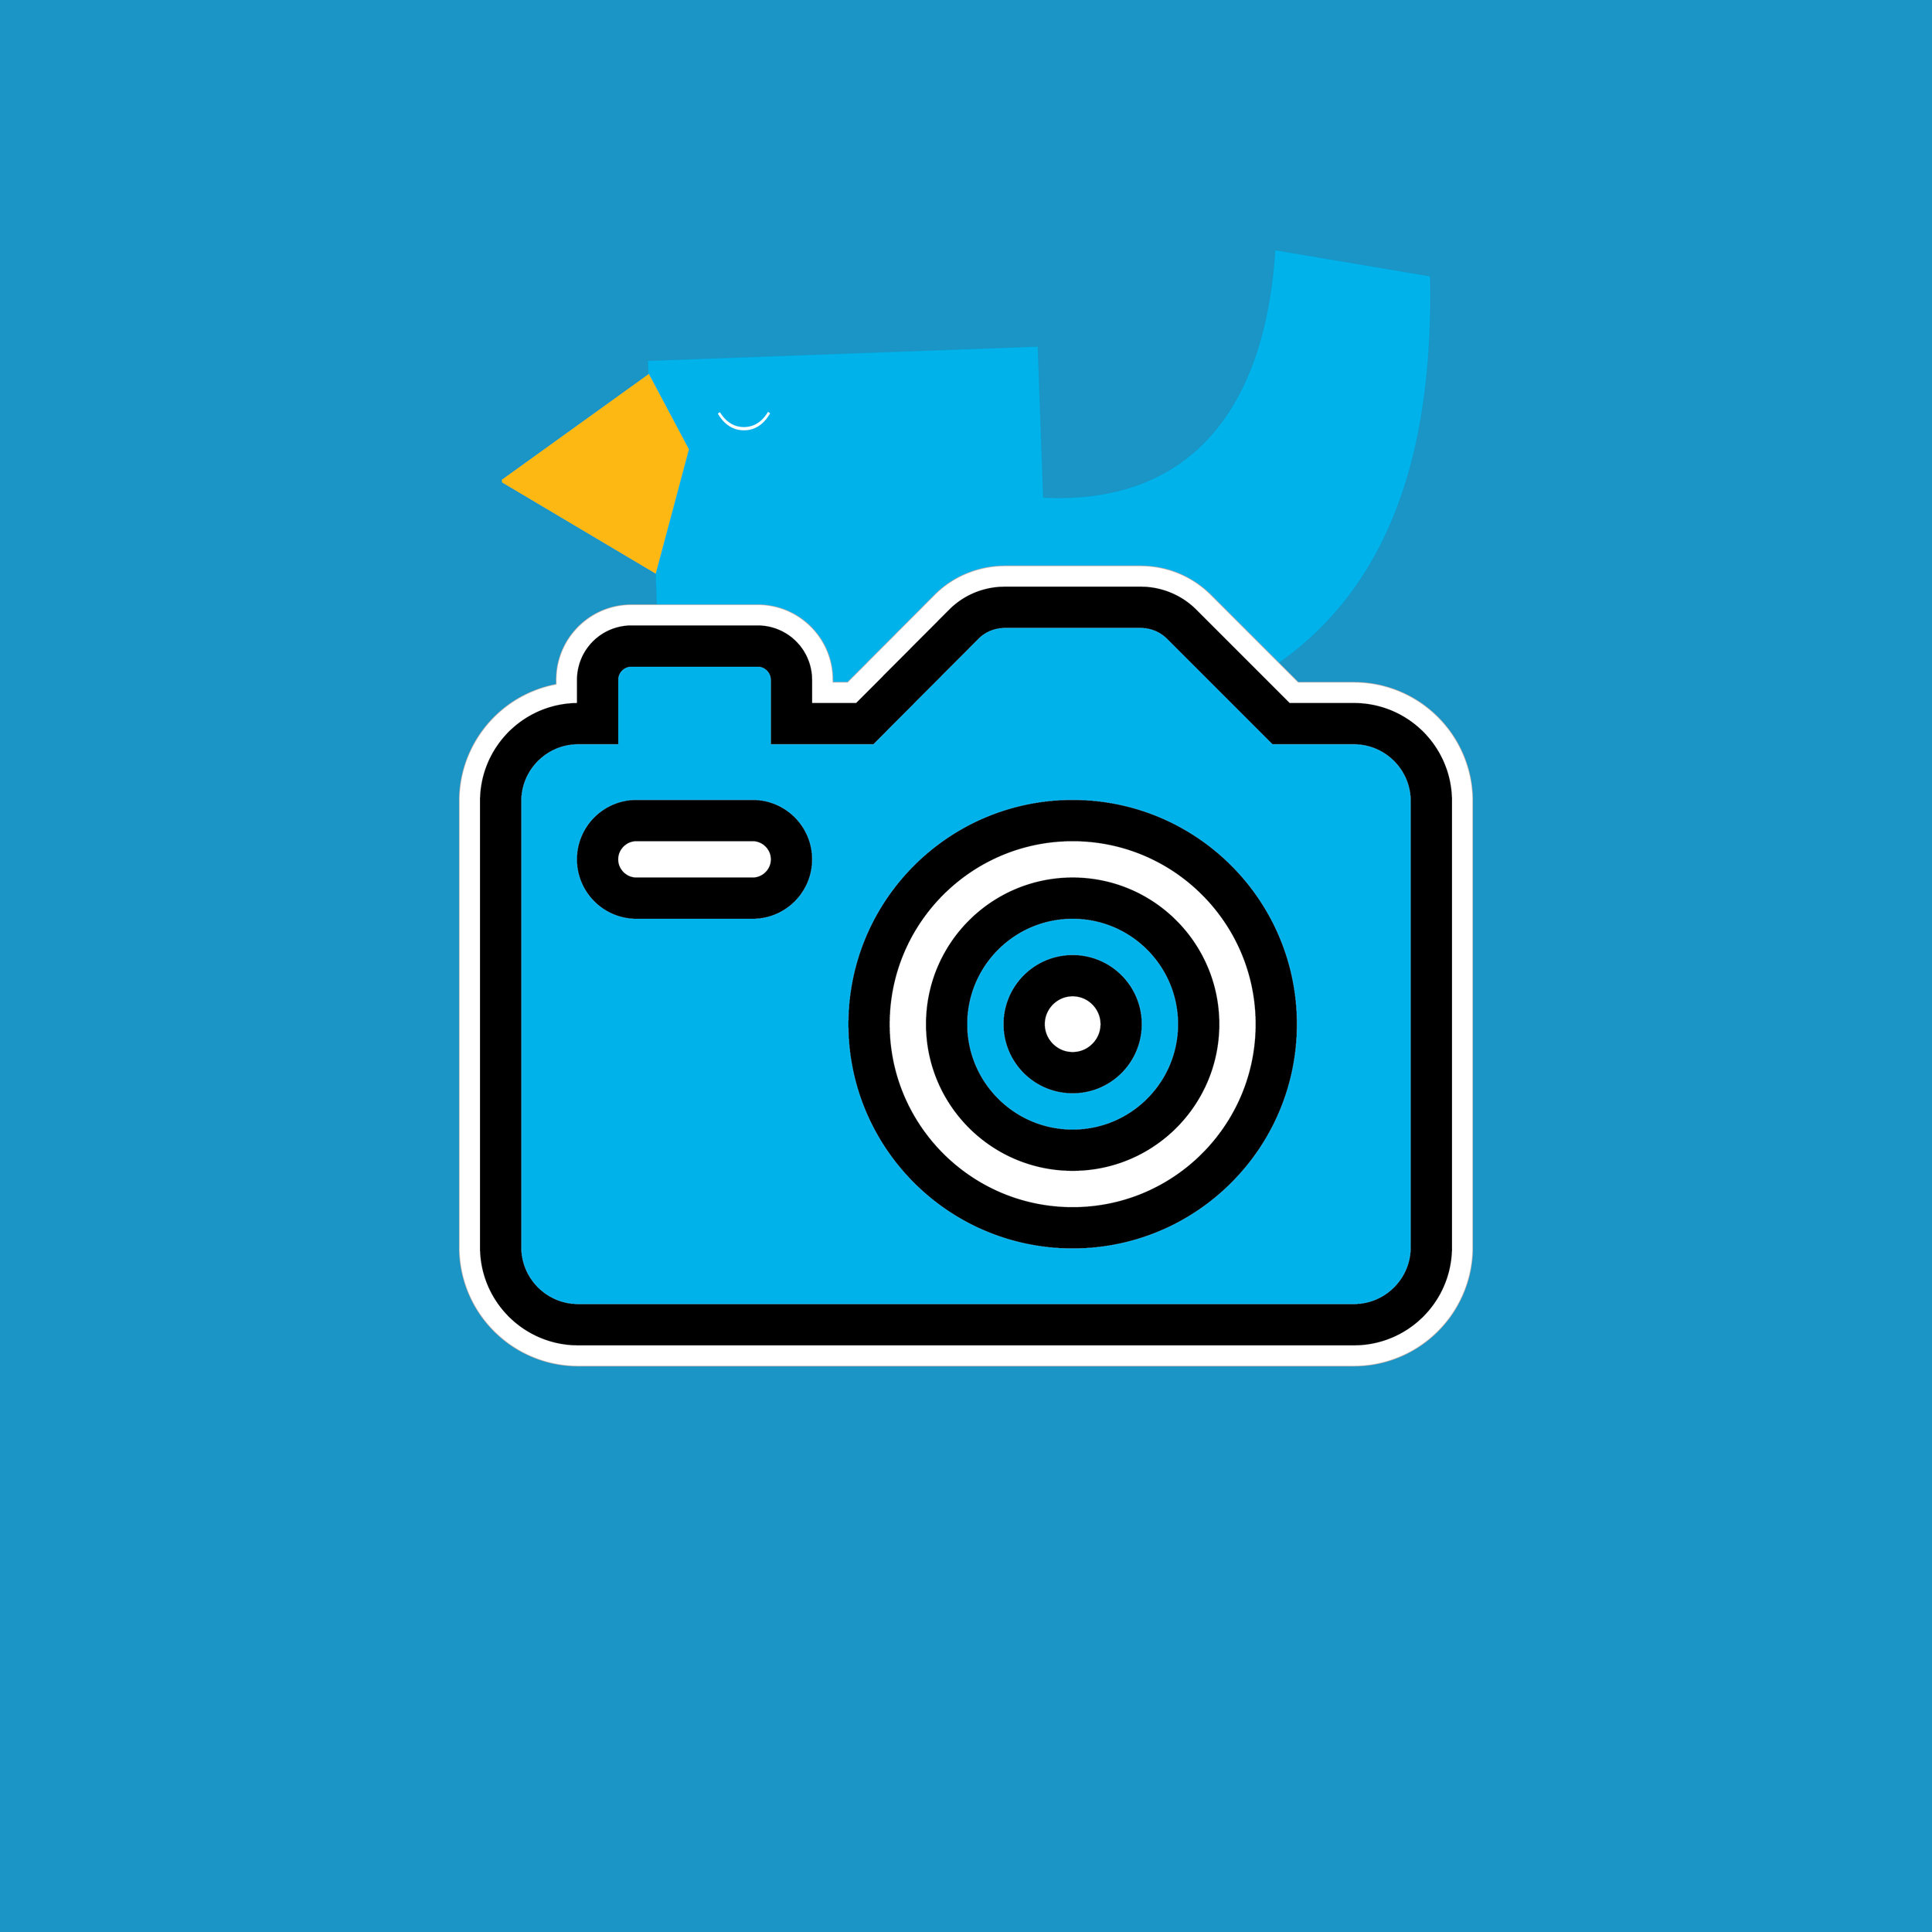 Photographer - • digital SLR• lenses (50mm, 18-135mm, 70-200mm)• tripod• flash